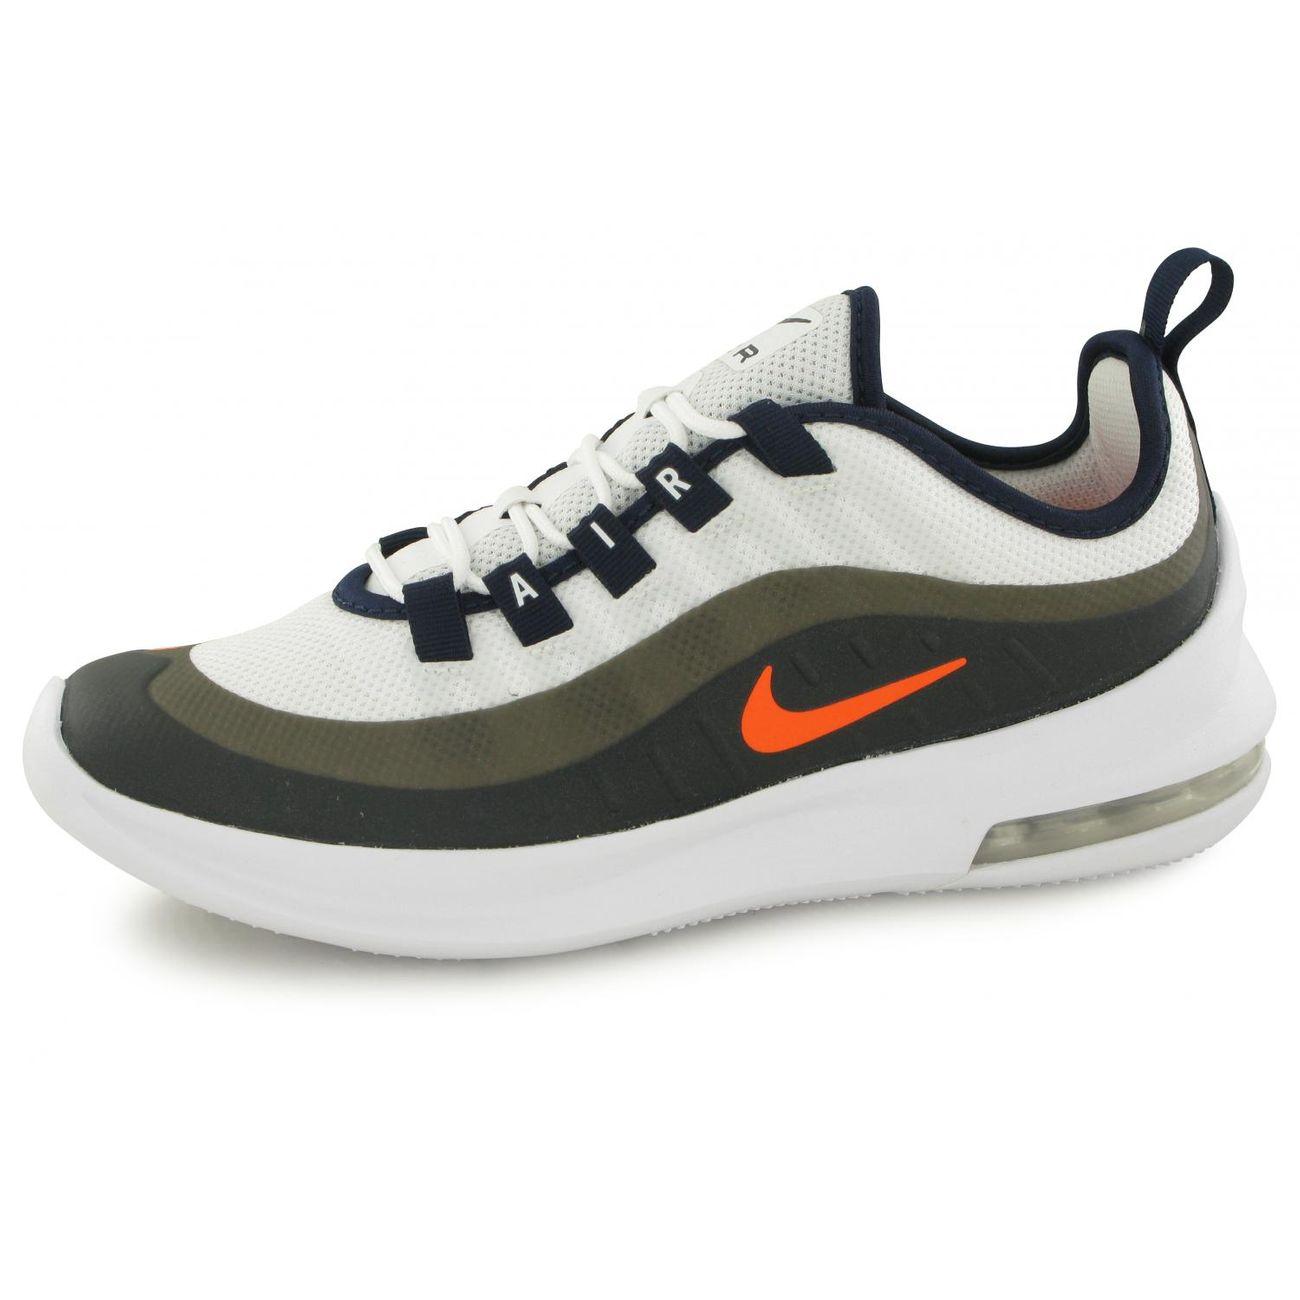 Nike Wmns Air Max Zero Chaussure Mixte Nike Sportswear Pas Cher (Taille FemmeEnfant) 1507081597 Officiel Nike Site! Chaussures Tn Distributeur